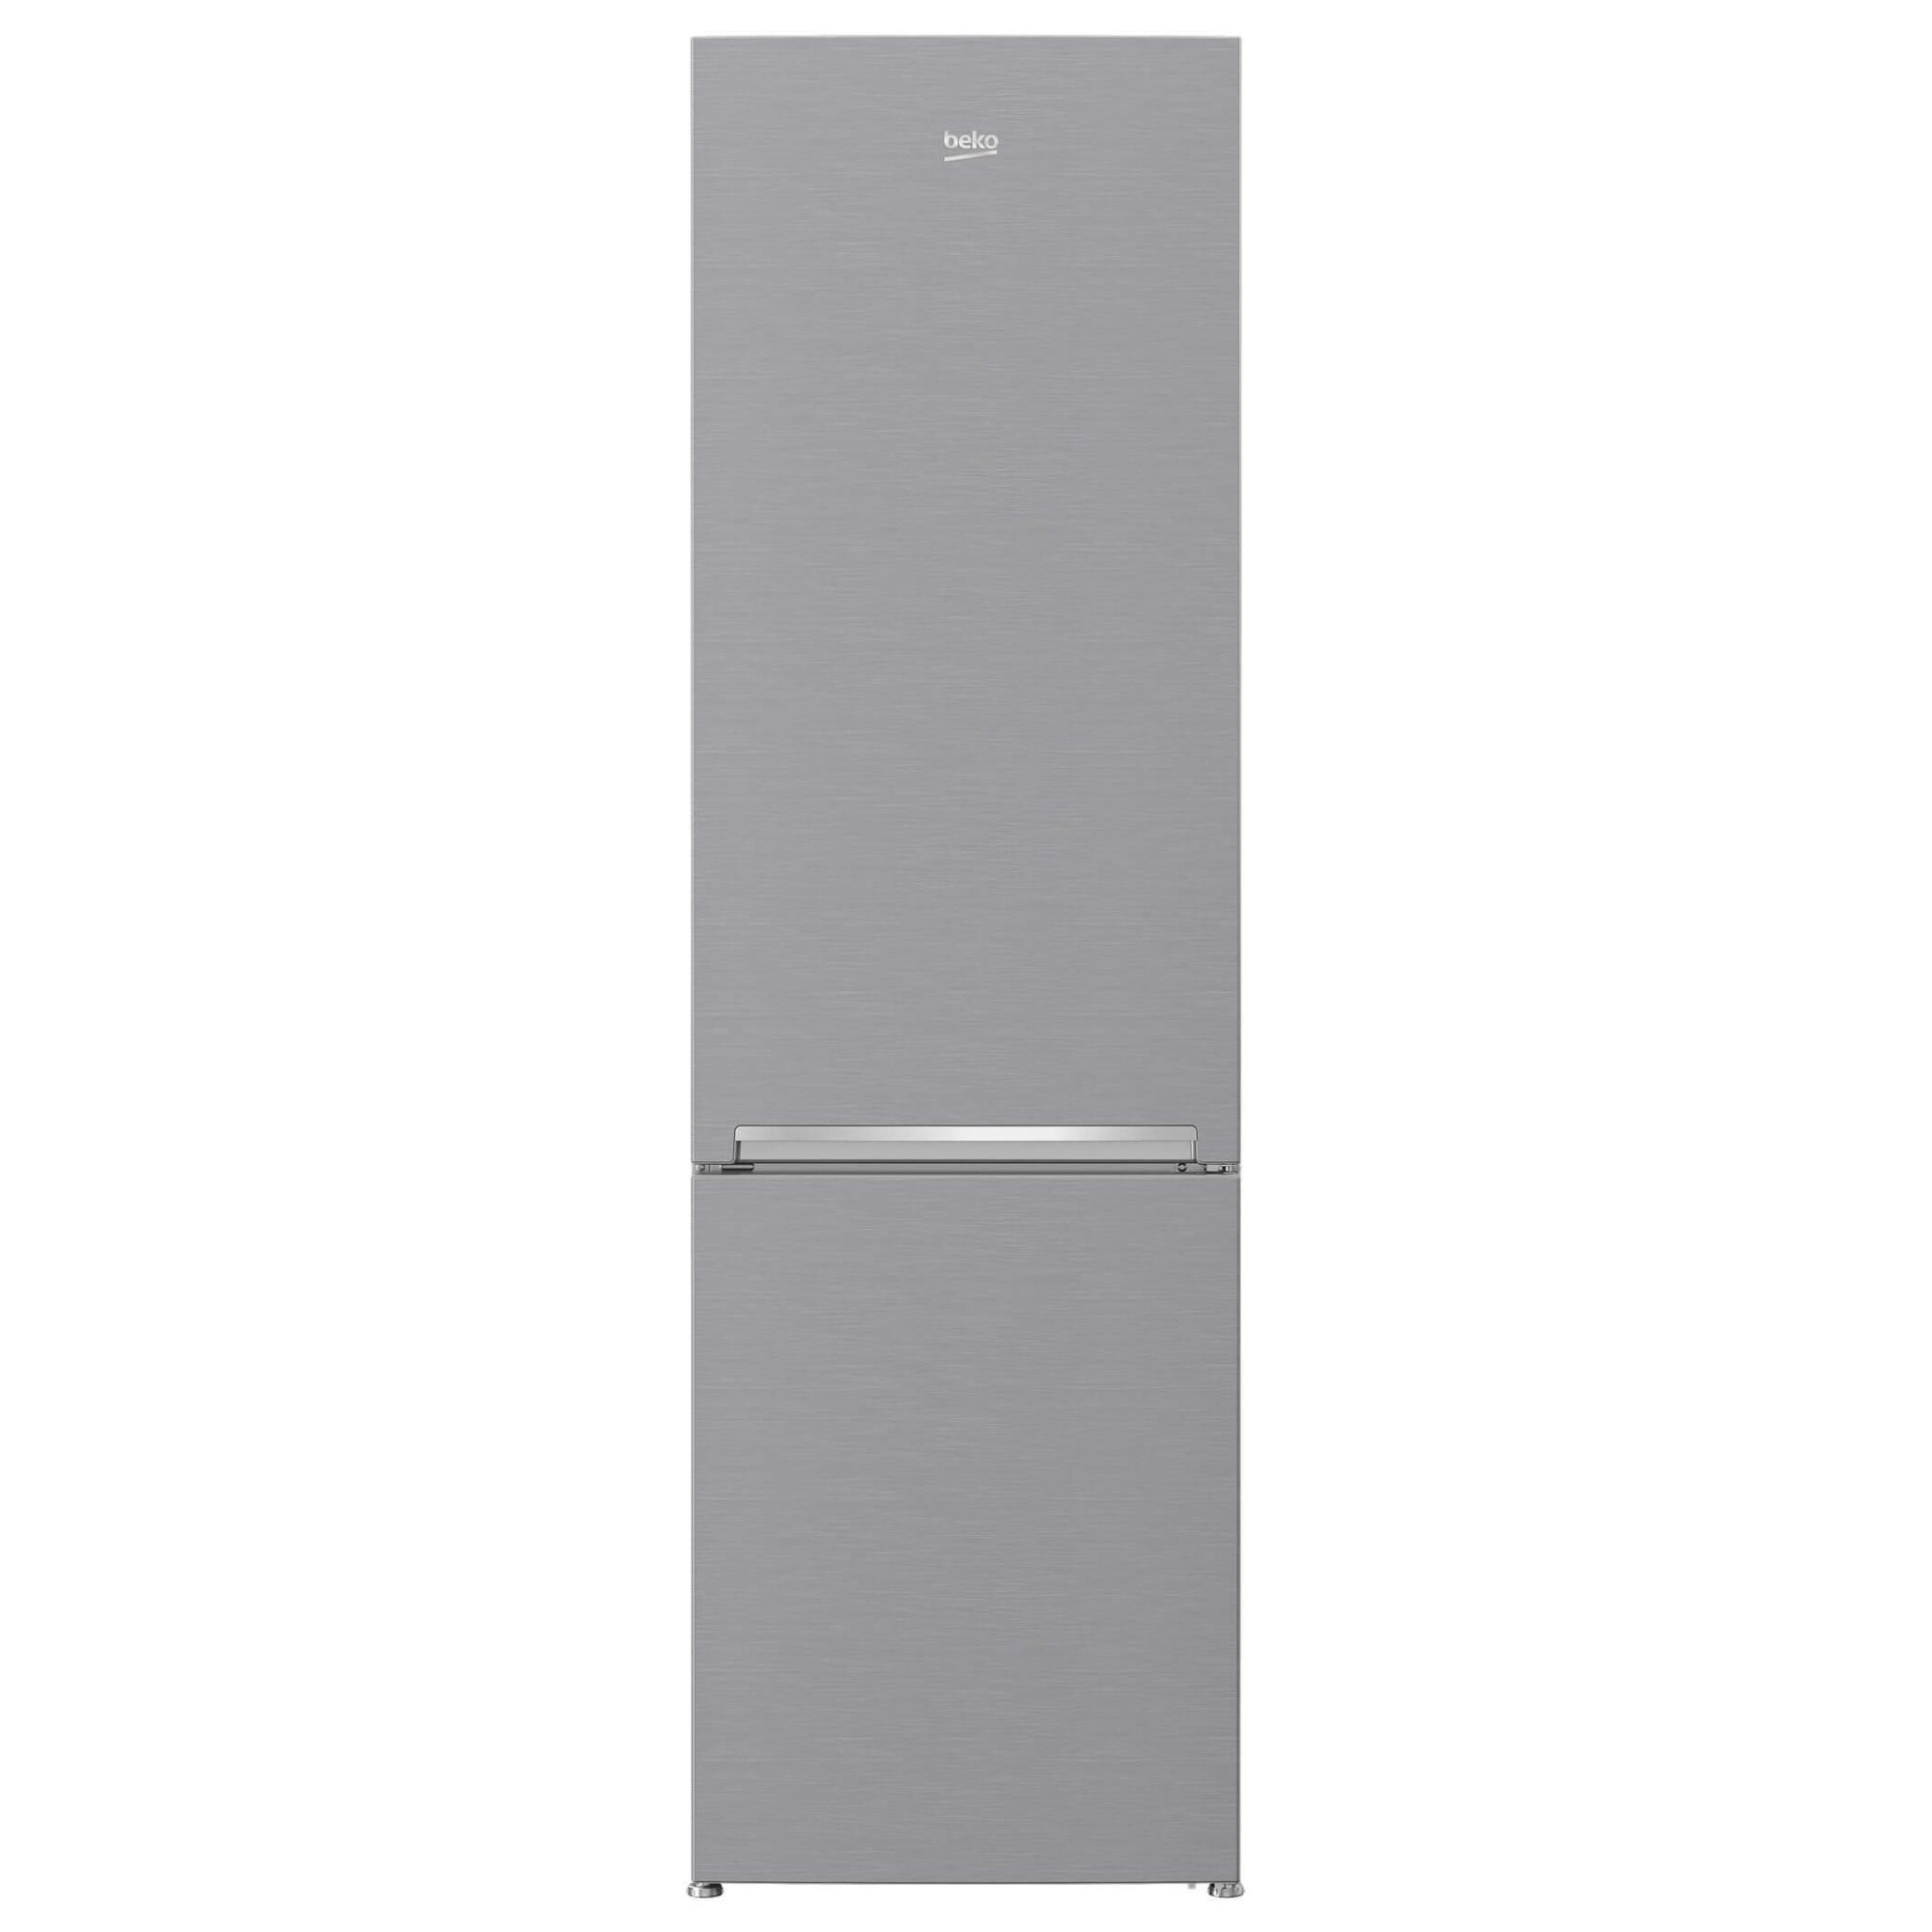 Fotografie Combina frigorifica Beko RCSA400K30XB, 380 l, Clasa A++, Active Fresh Blue Light, Compartiment 0°-3°C, H 201 cm, Argintiu